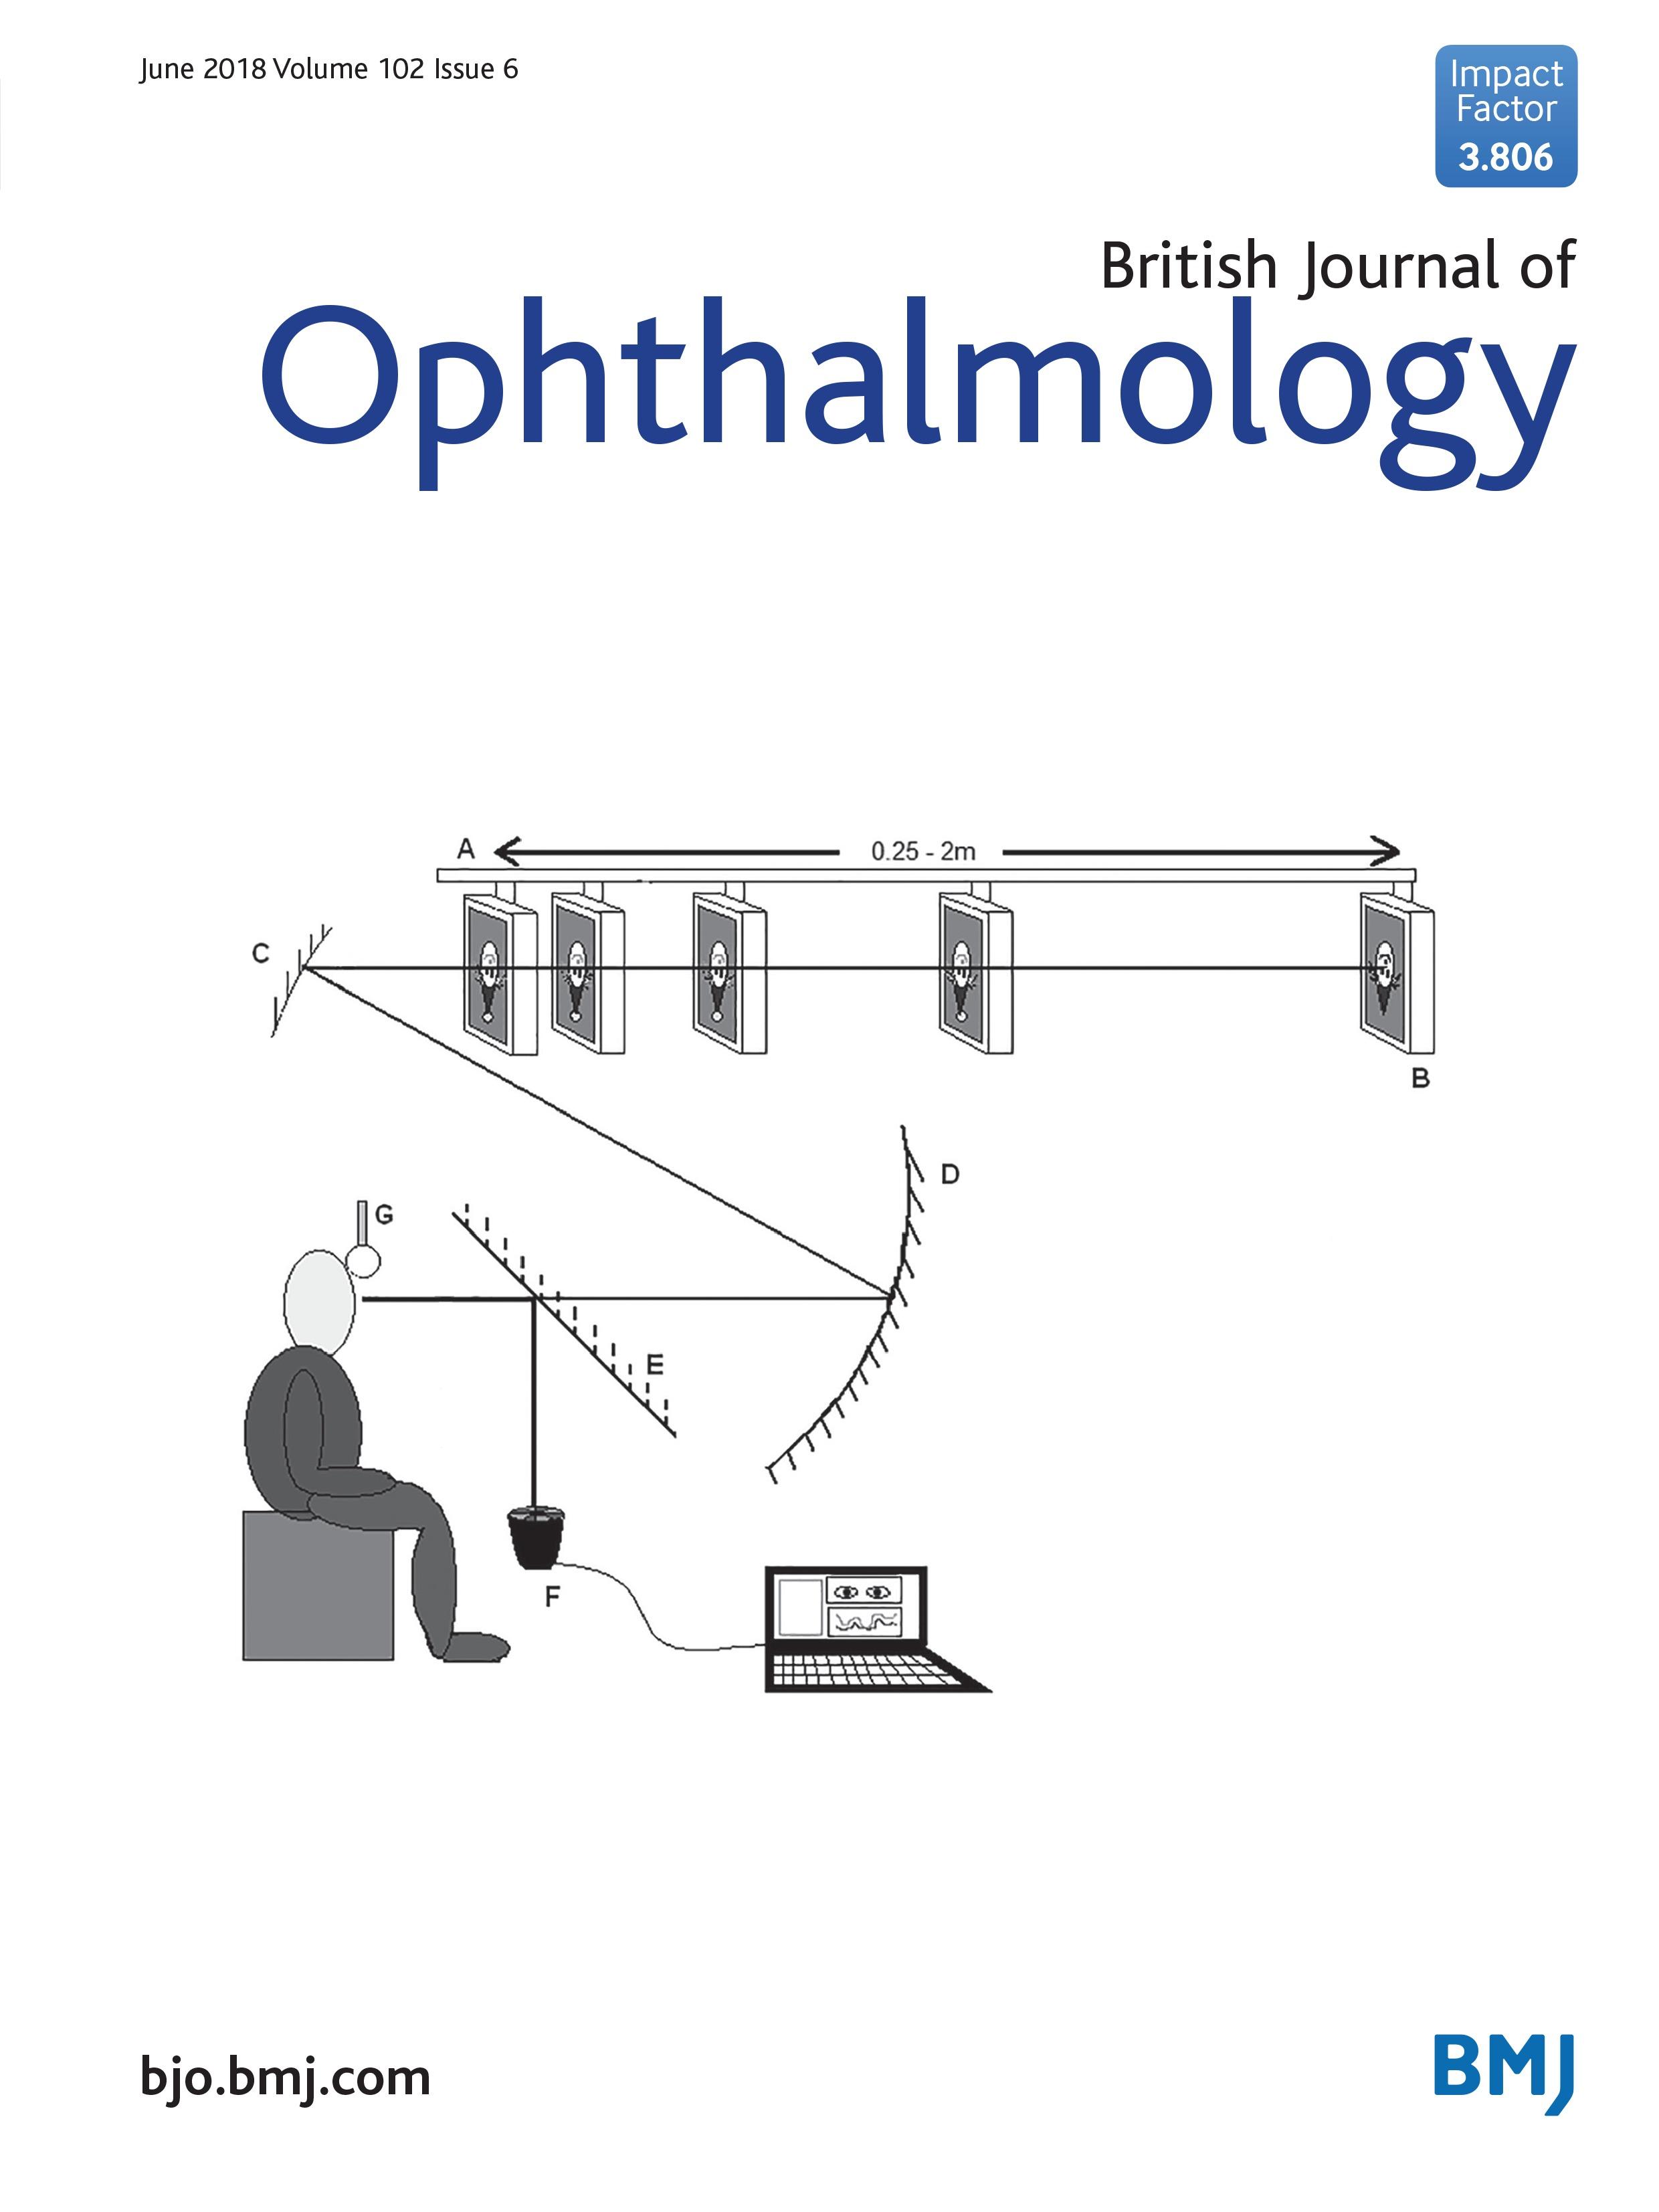 Non Invasive Method Of Monitoring Retinal Vasculitis In Patients Circuit Diagram Glucose Meter With Birdshot Chorioretinopathy Using Optical Coherence Tomography British Journal